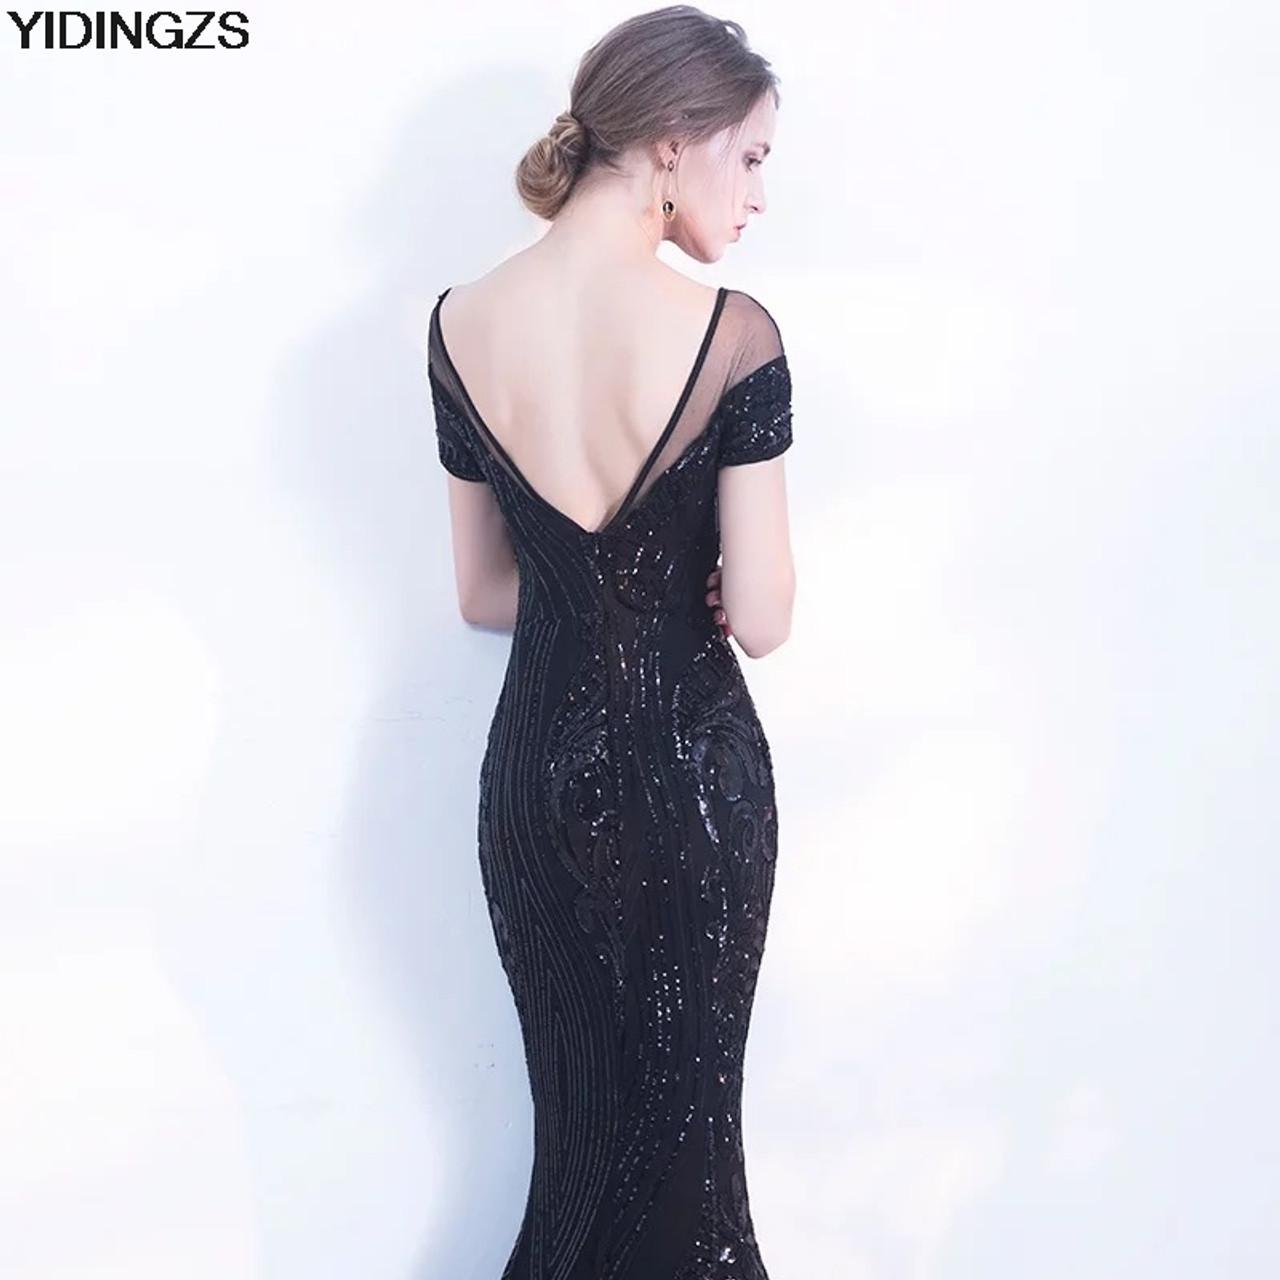 ... YIDINGZS Elegant Backless Long Evening Dress Mermaid Black Party  Sequins Maxi Dress ... b7d17346919e